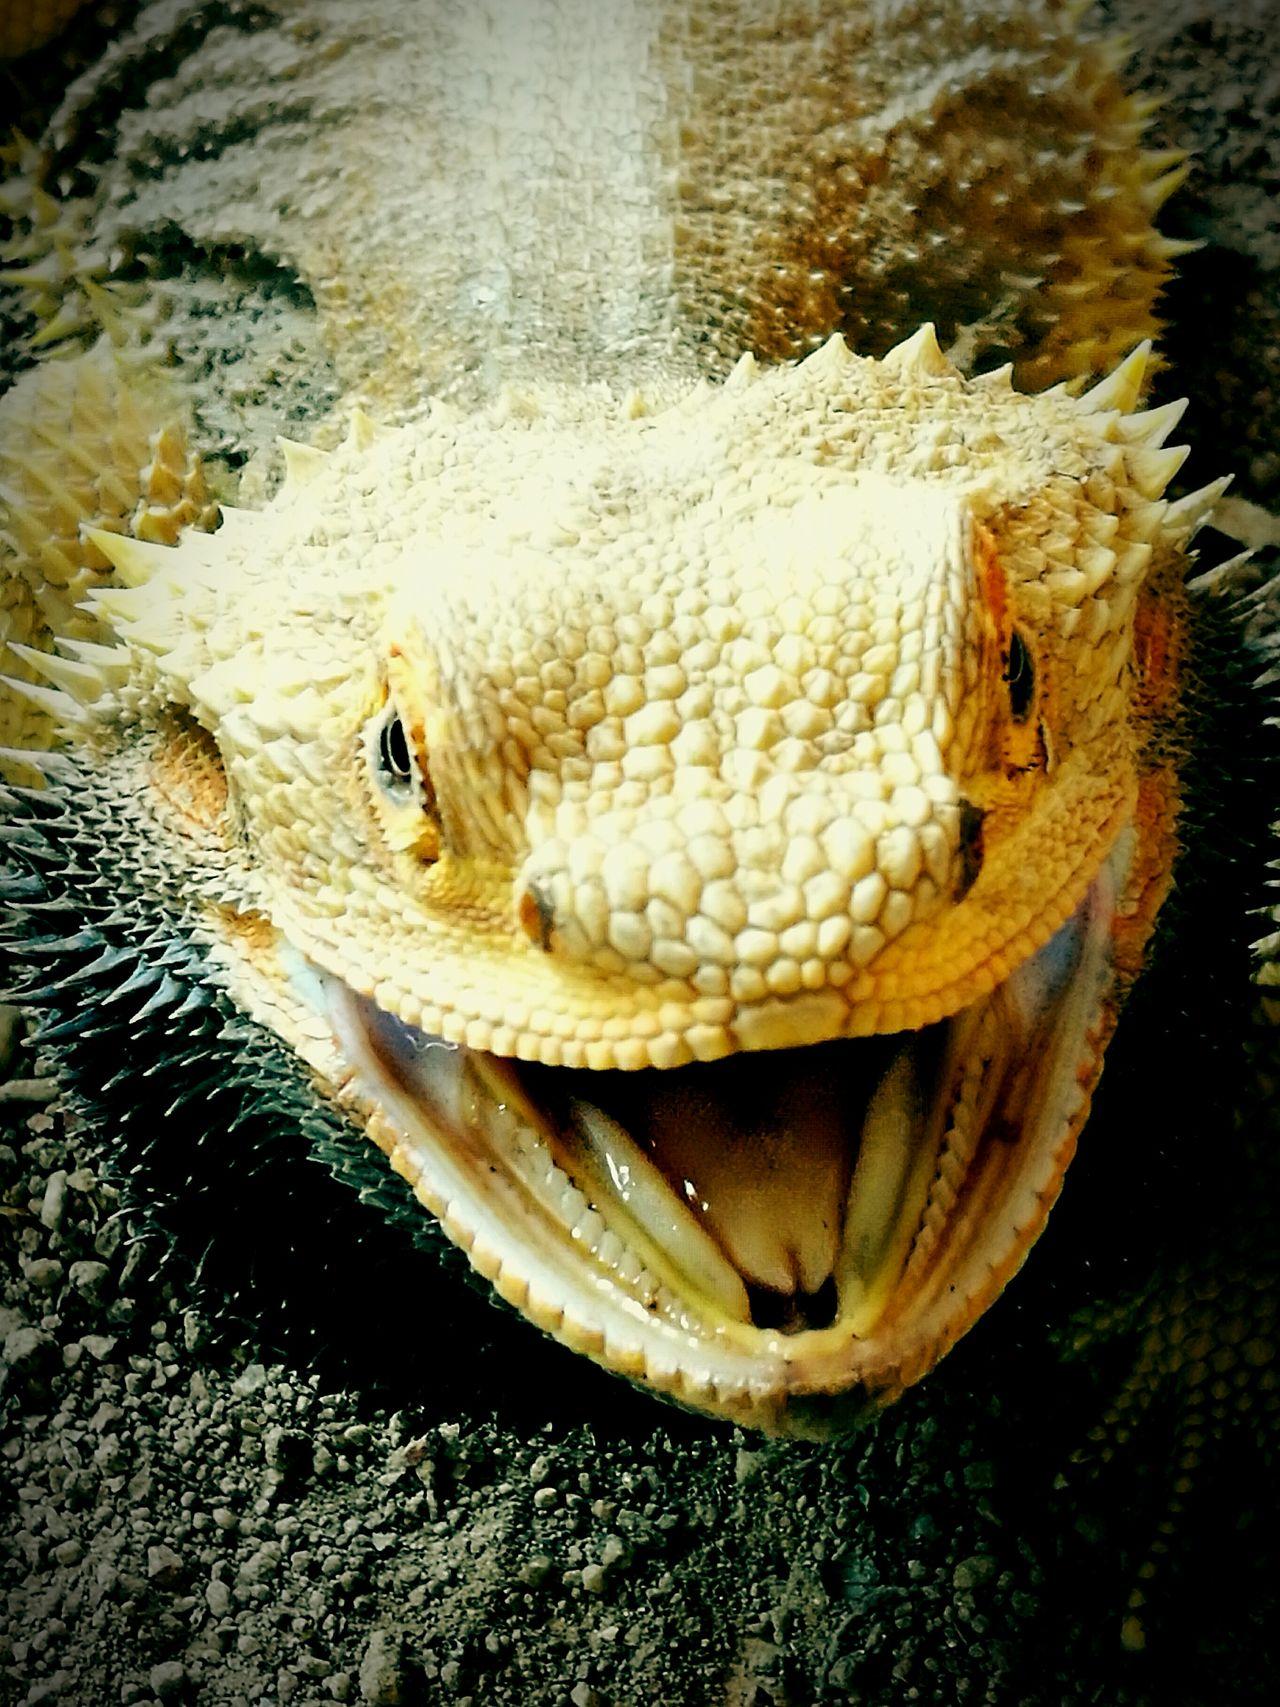 Bearded Dragon Lizard Australian Reptile